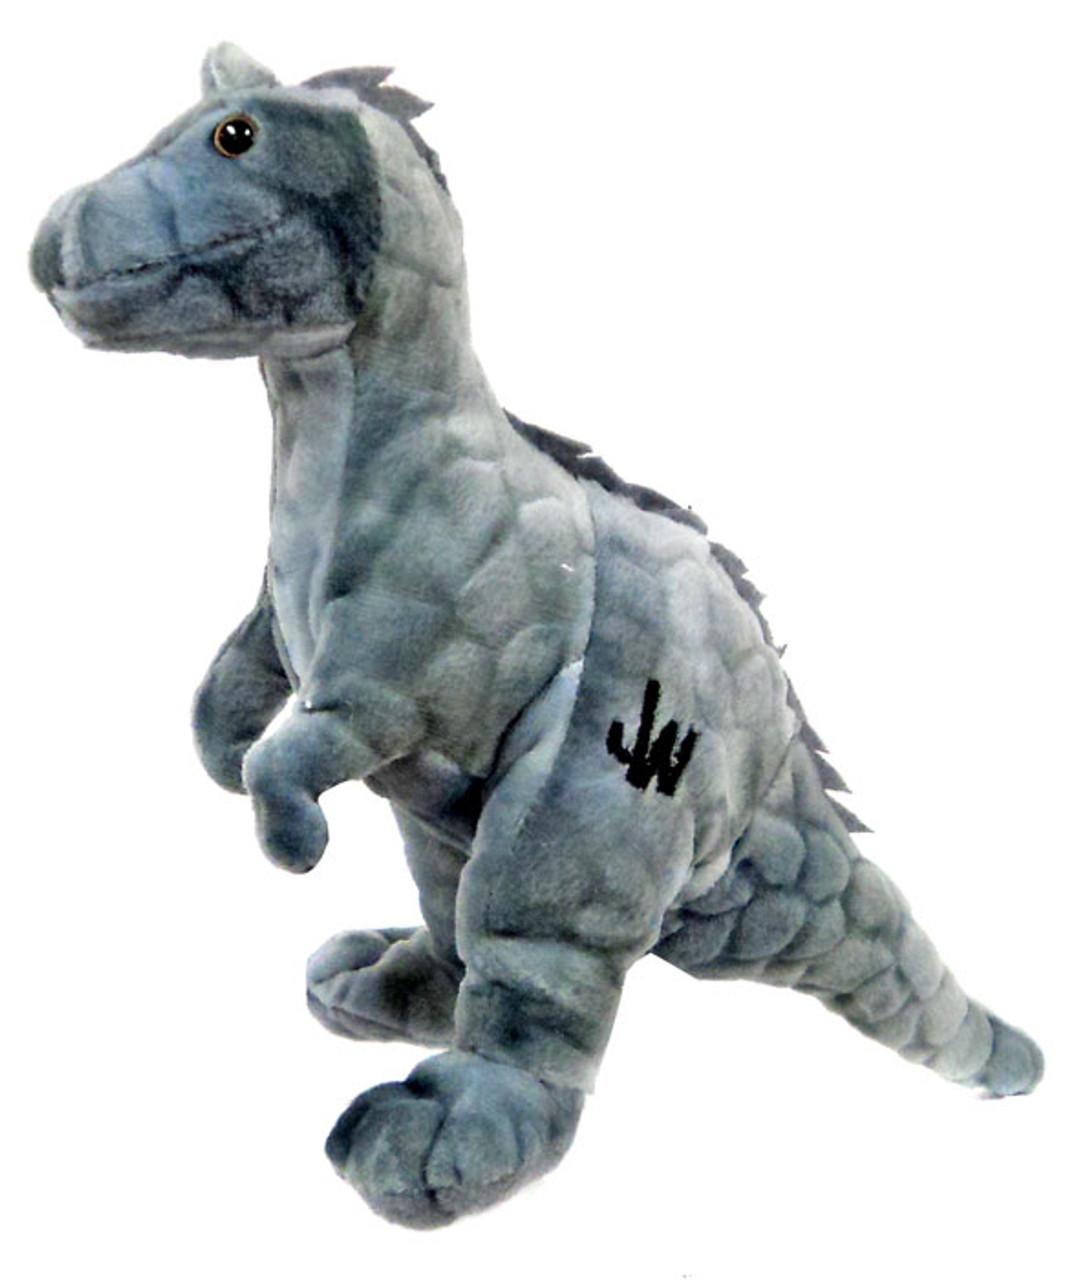 Jurassic World Indominus Rex 7-Inch Plush